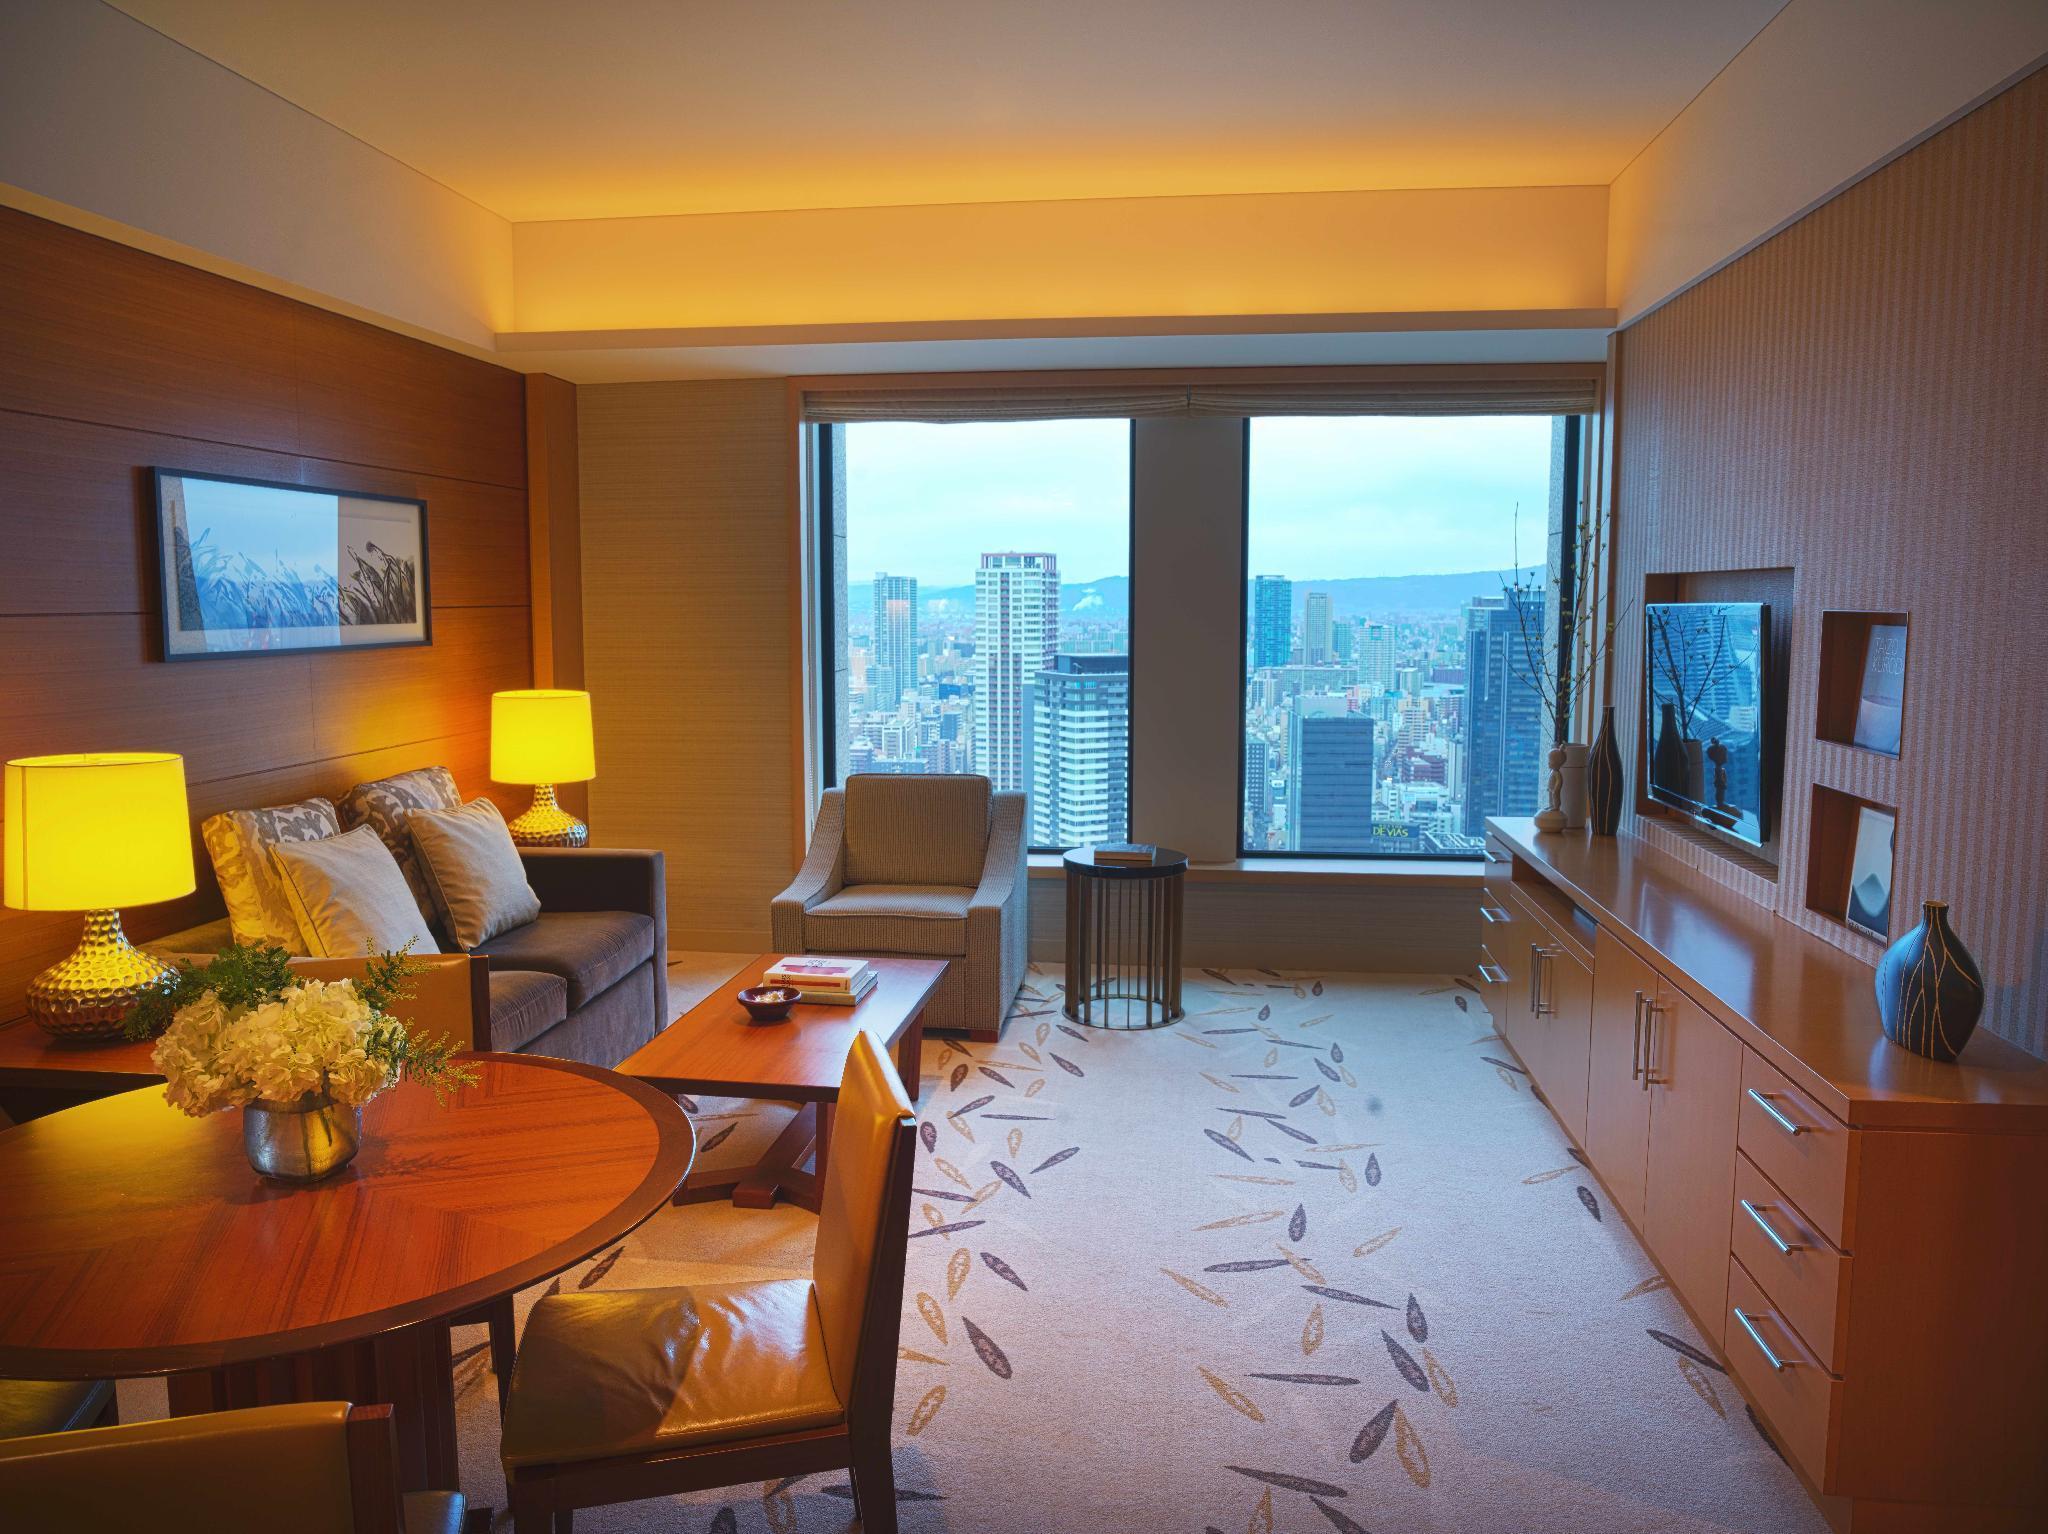 InterContinental Hotel Osaka in Japan - Room Deals, Photos & Reviews